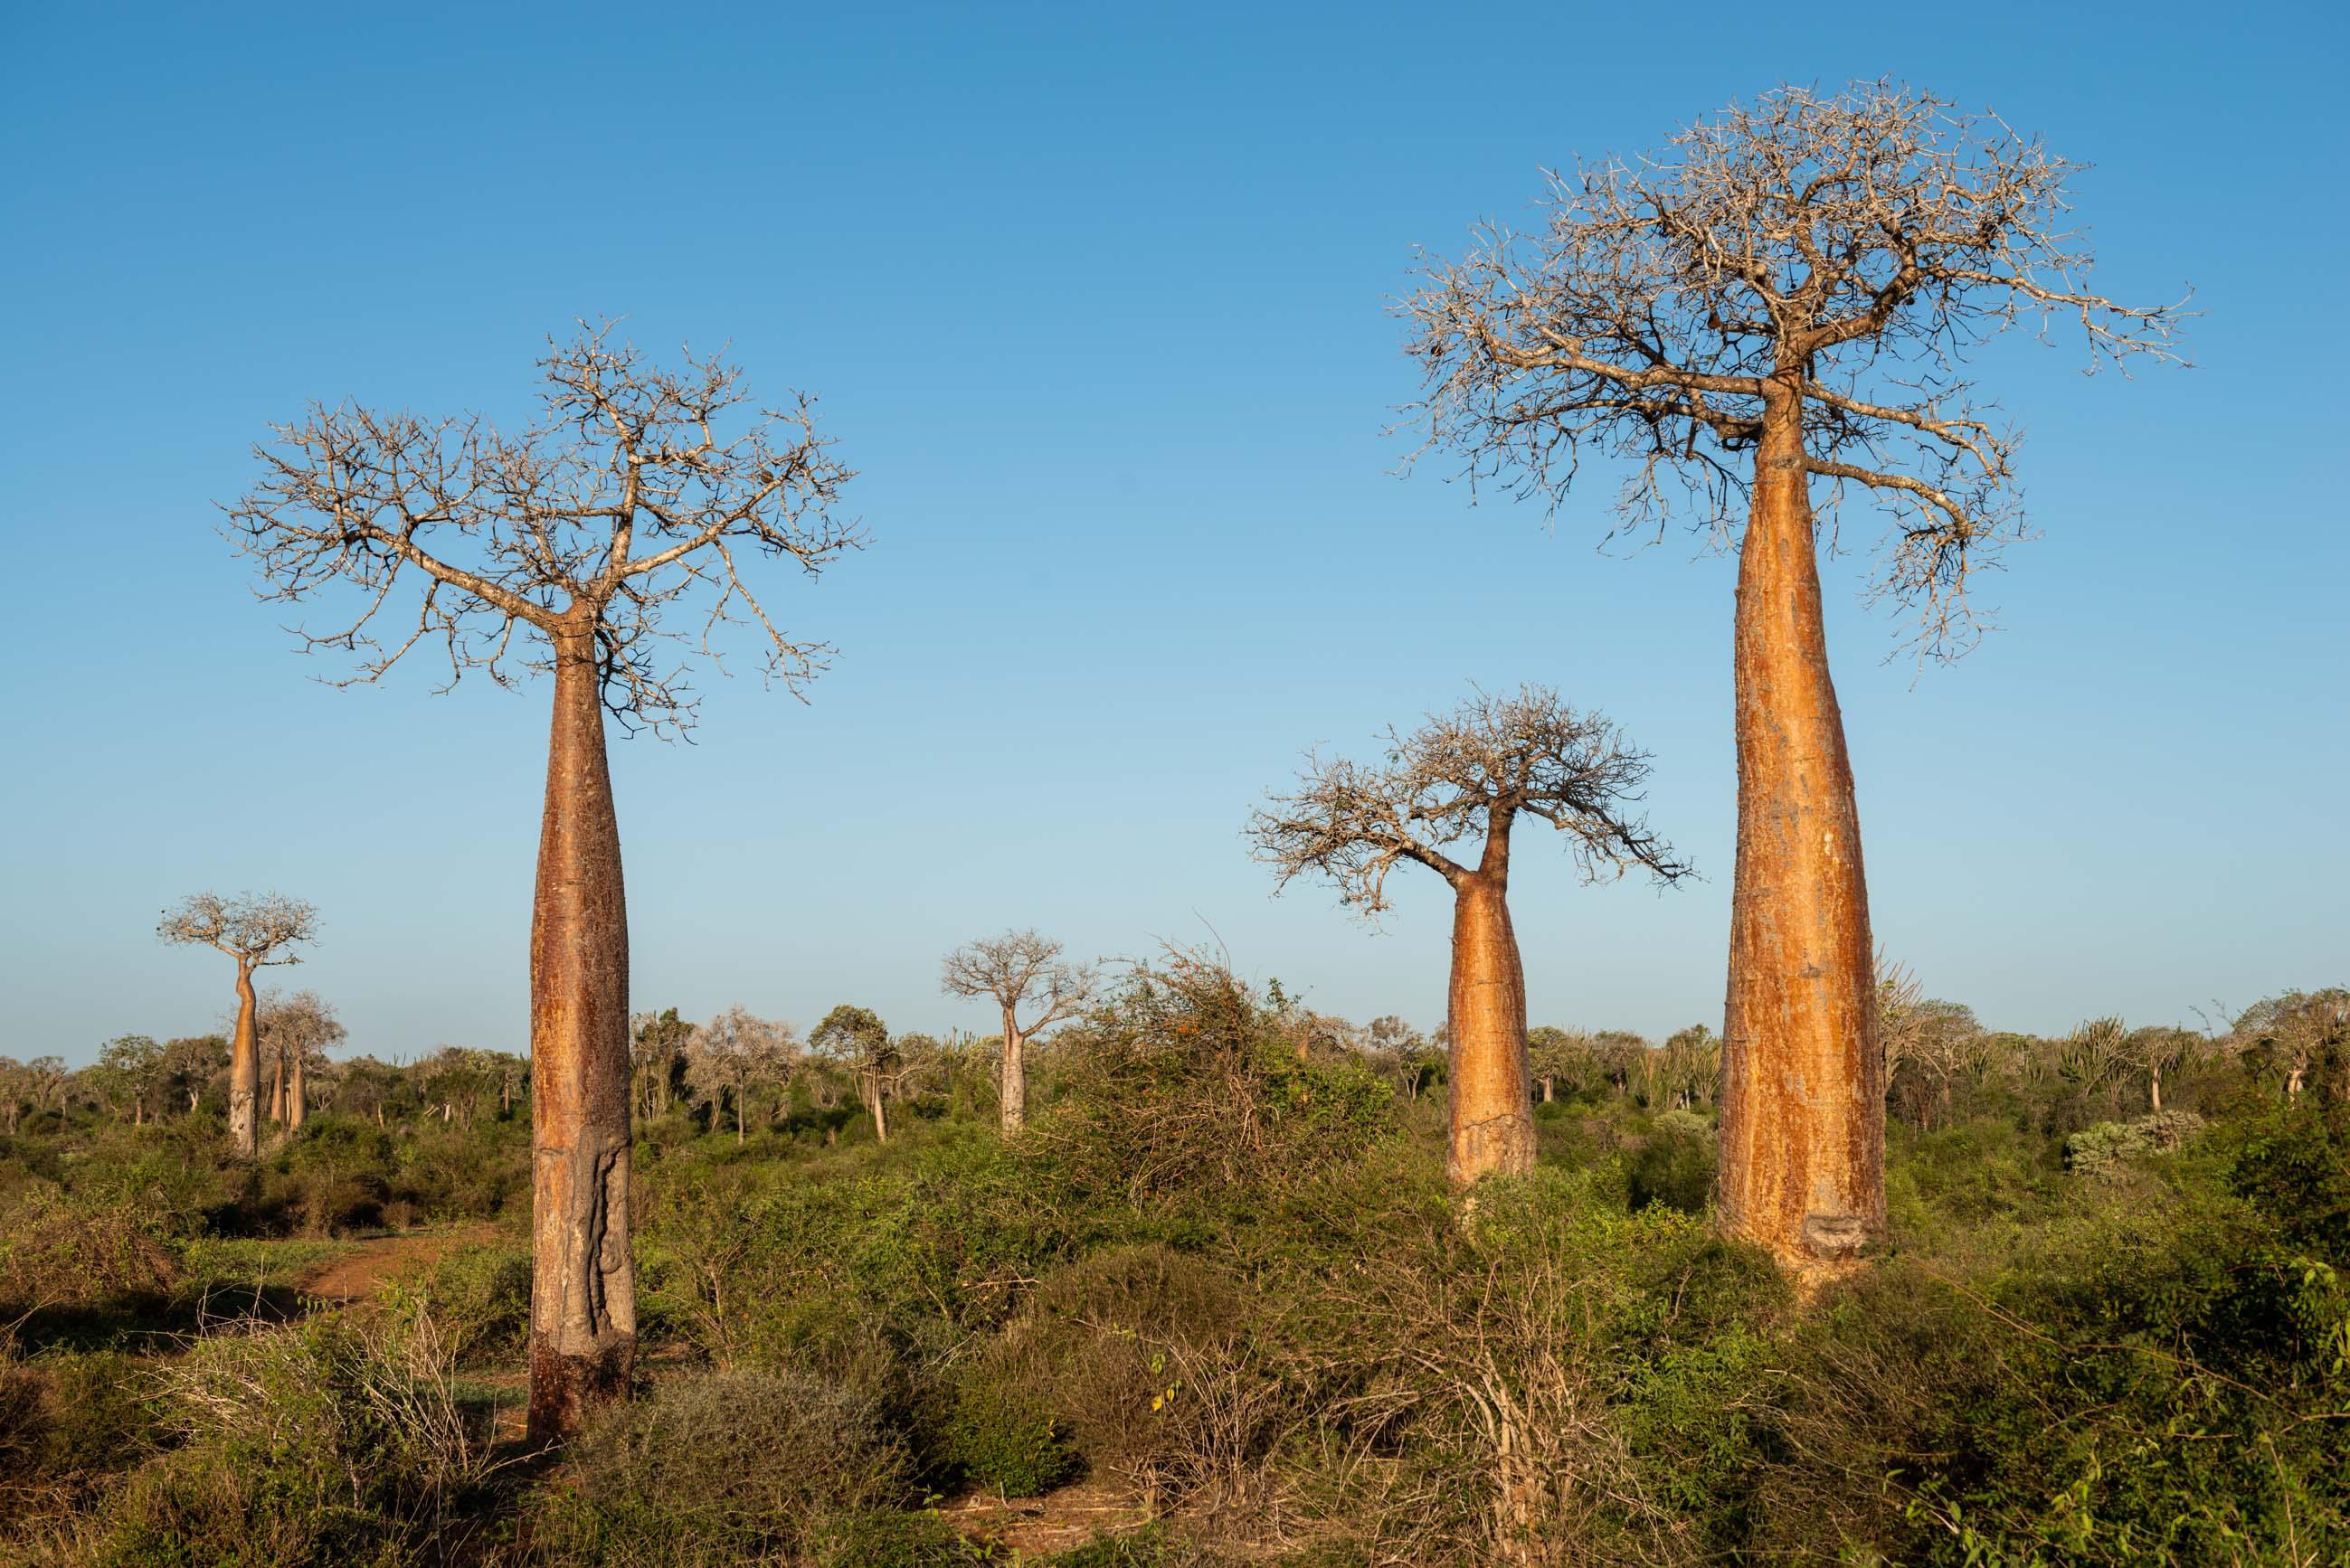 https://bubo.sk/uploads/galleries/7310/roberttaraba_madagaskar_baobab3-1---copy.jpg